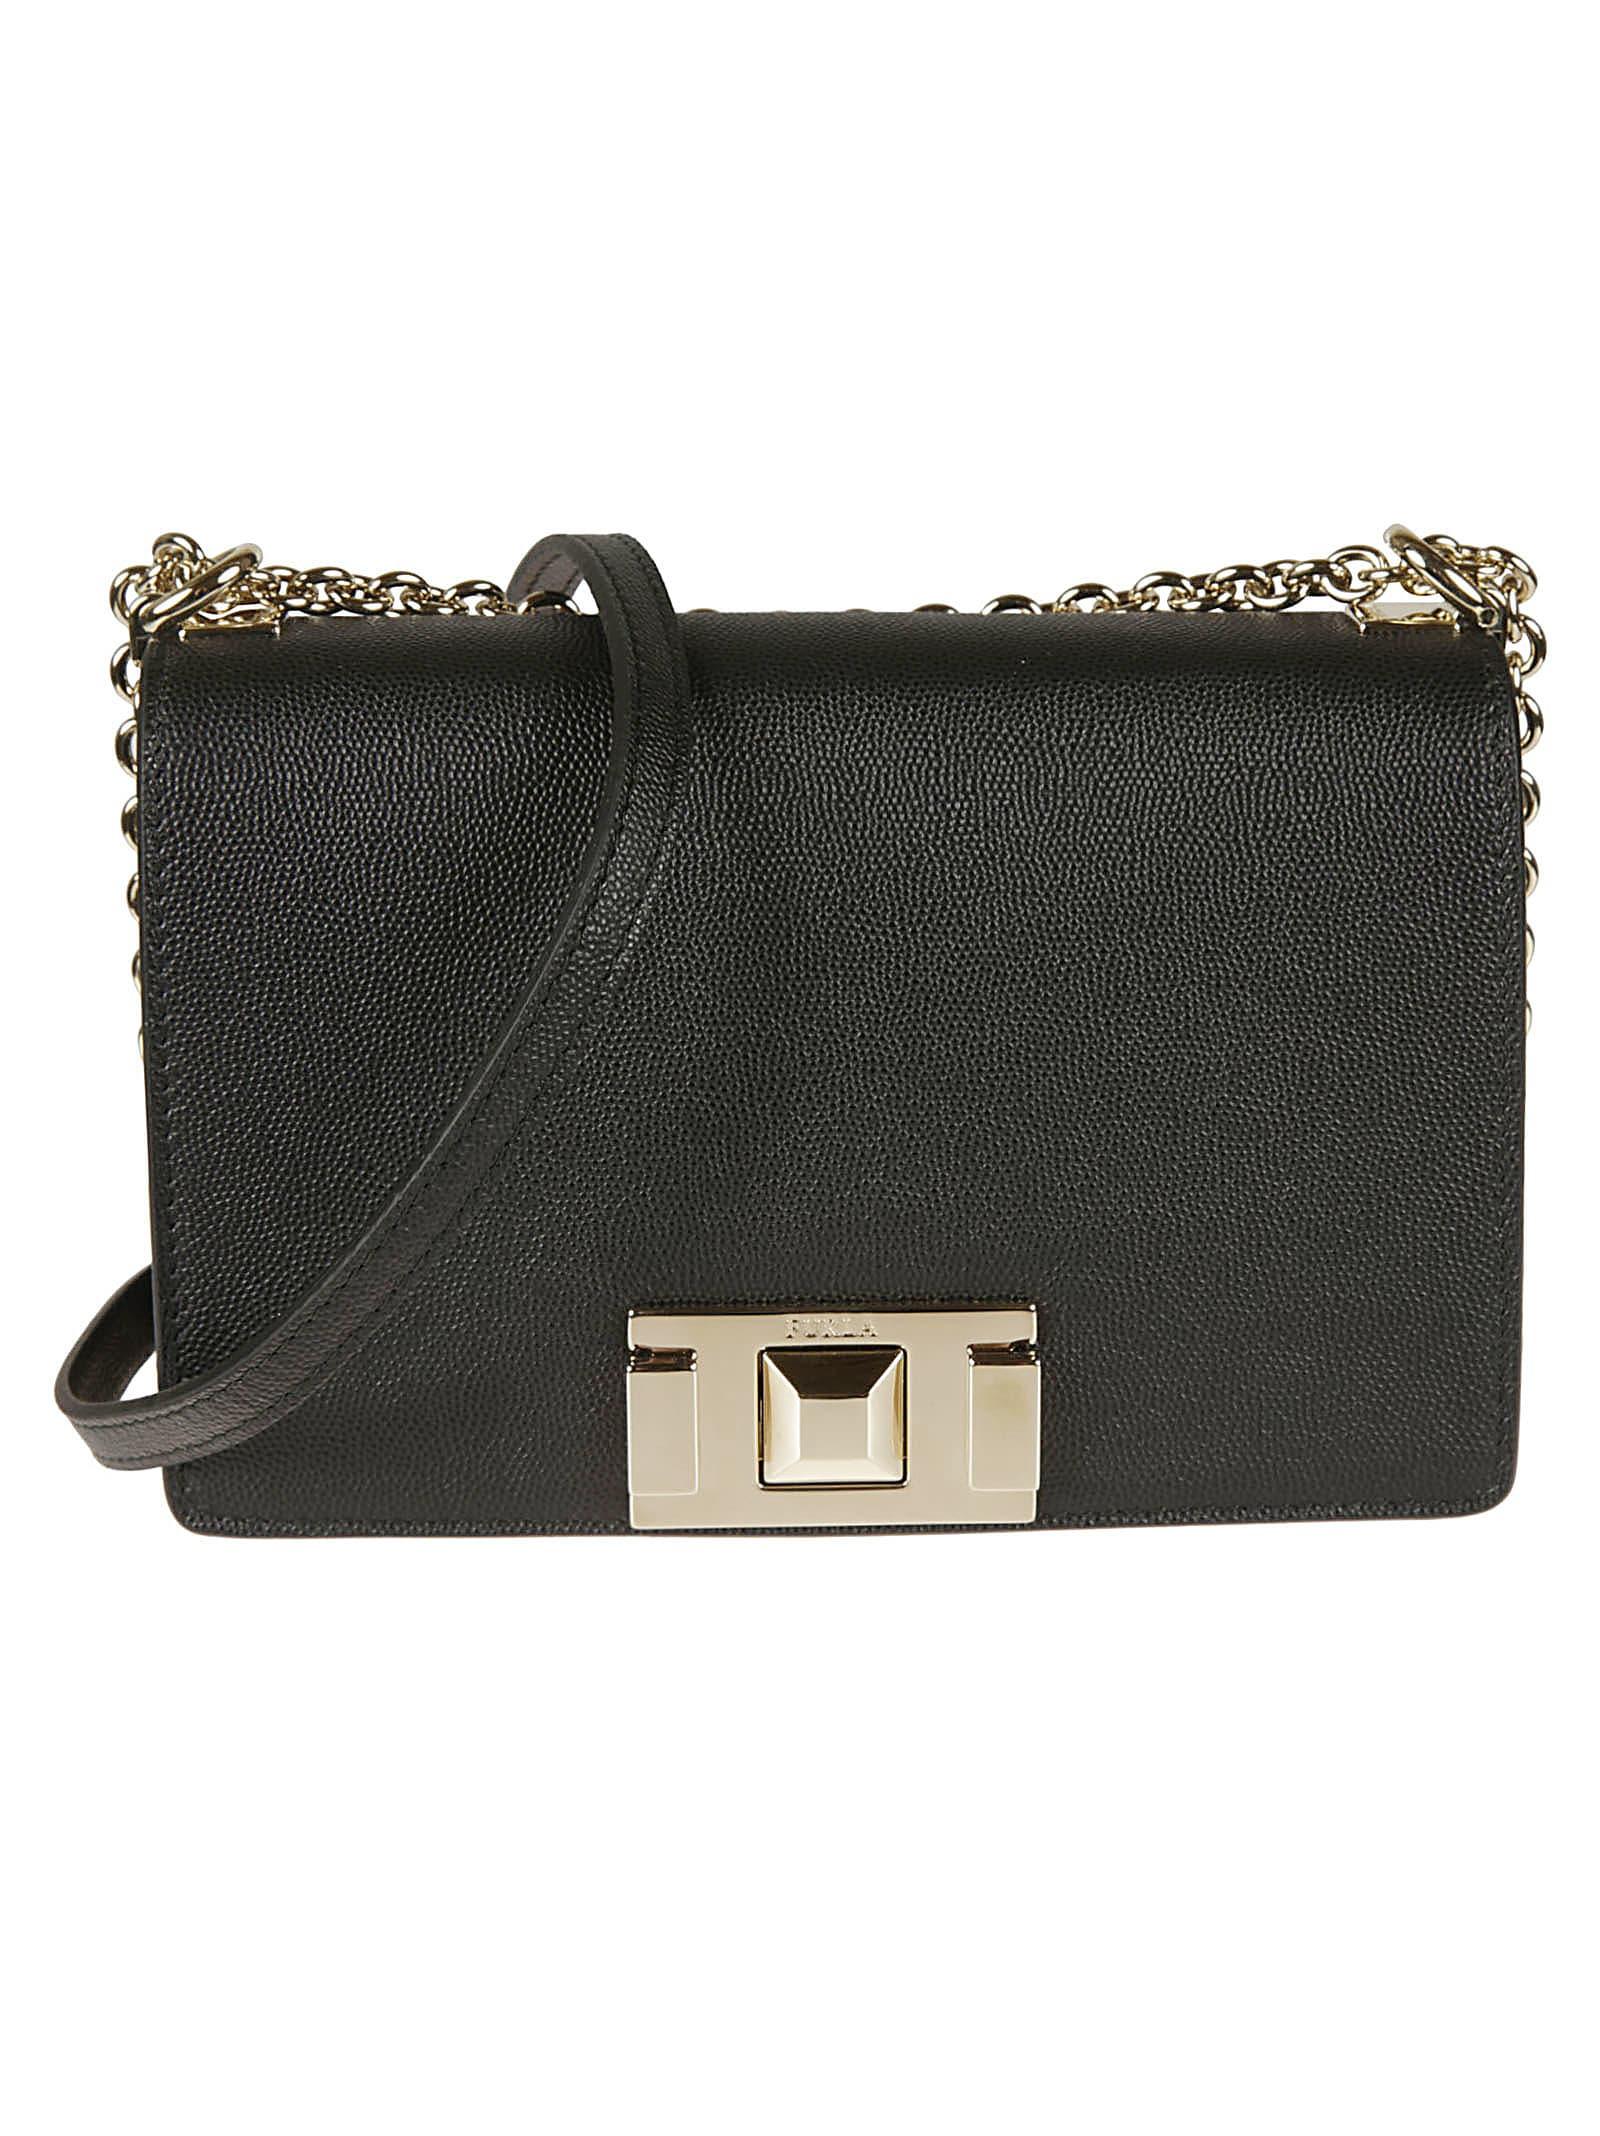 Furla Flap Chain Shoulder Bag